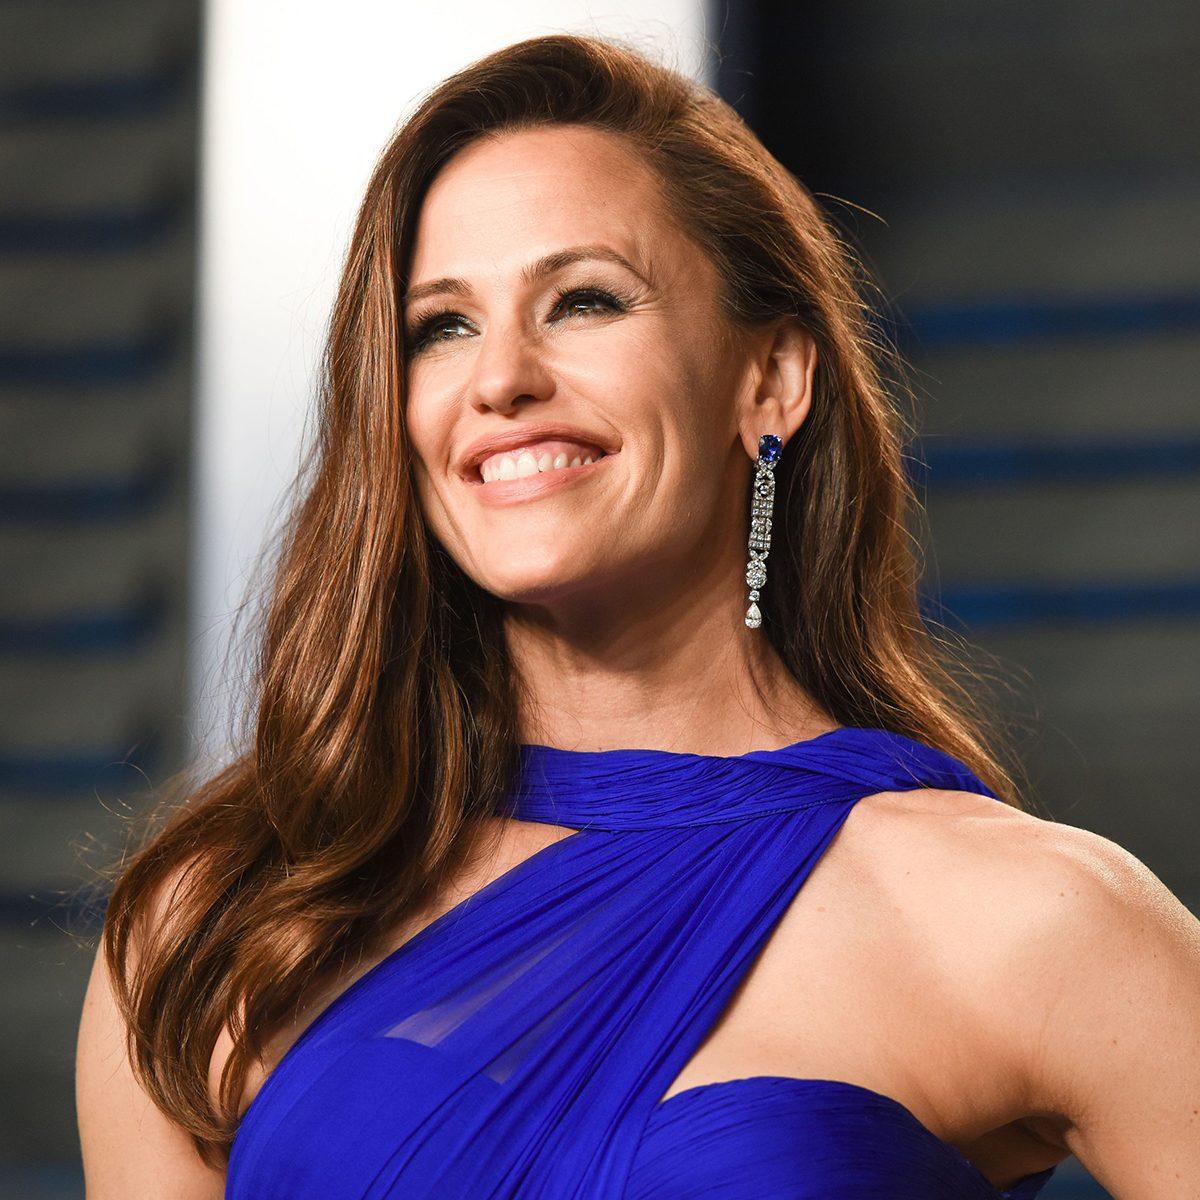 Jennifer Garner Vanity Fair Oscar Party, Arrivals, Los Angeles, USA - 04 Mar 2018